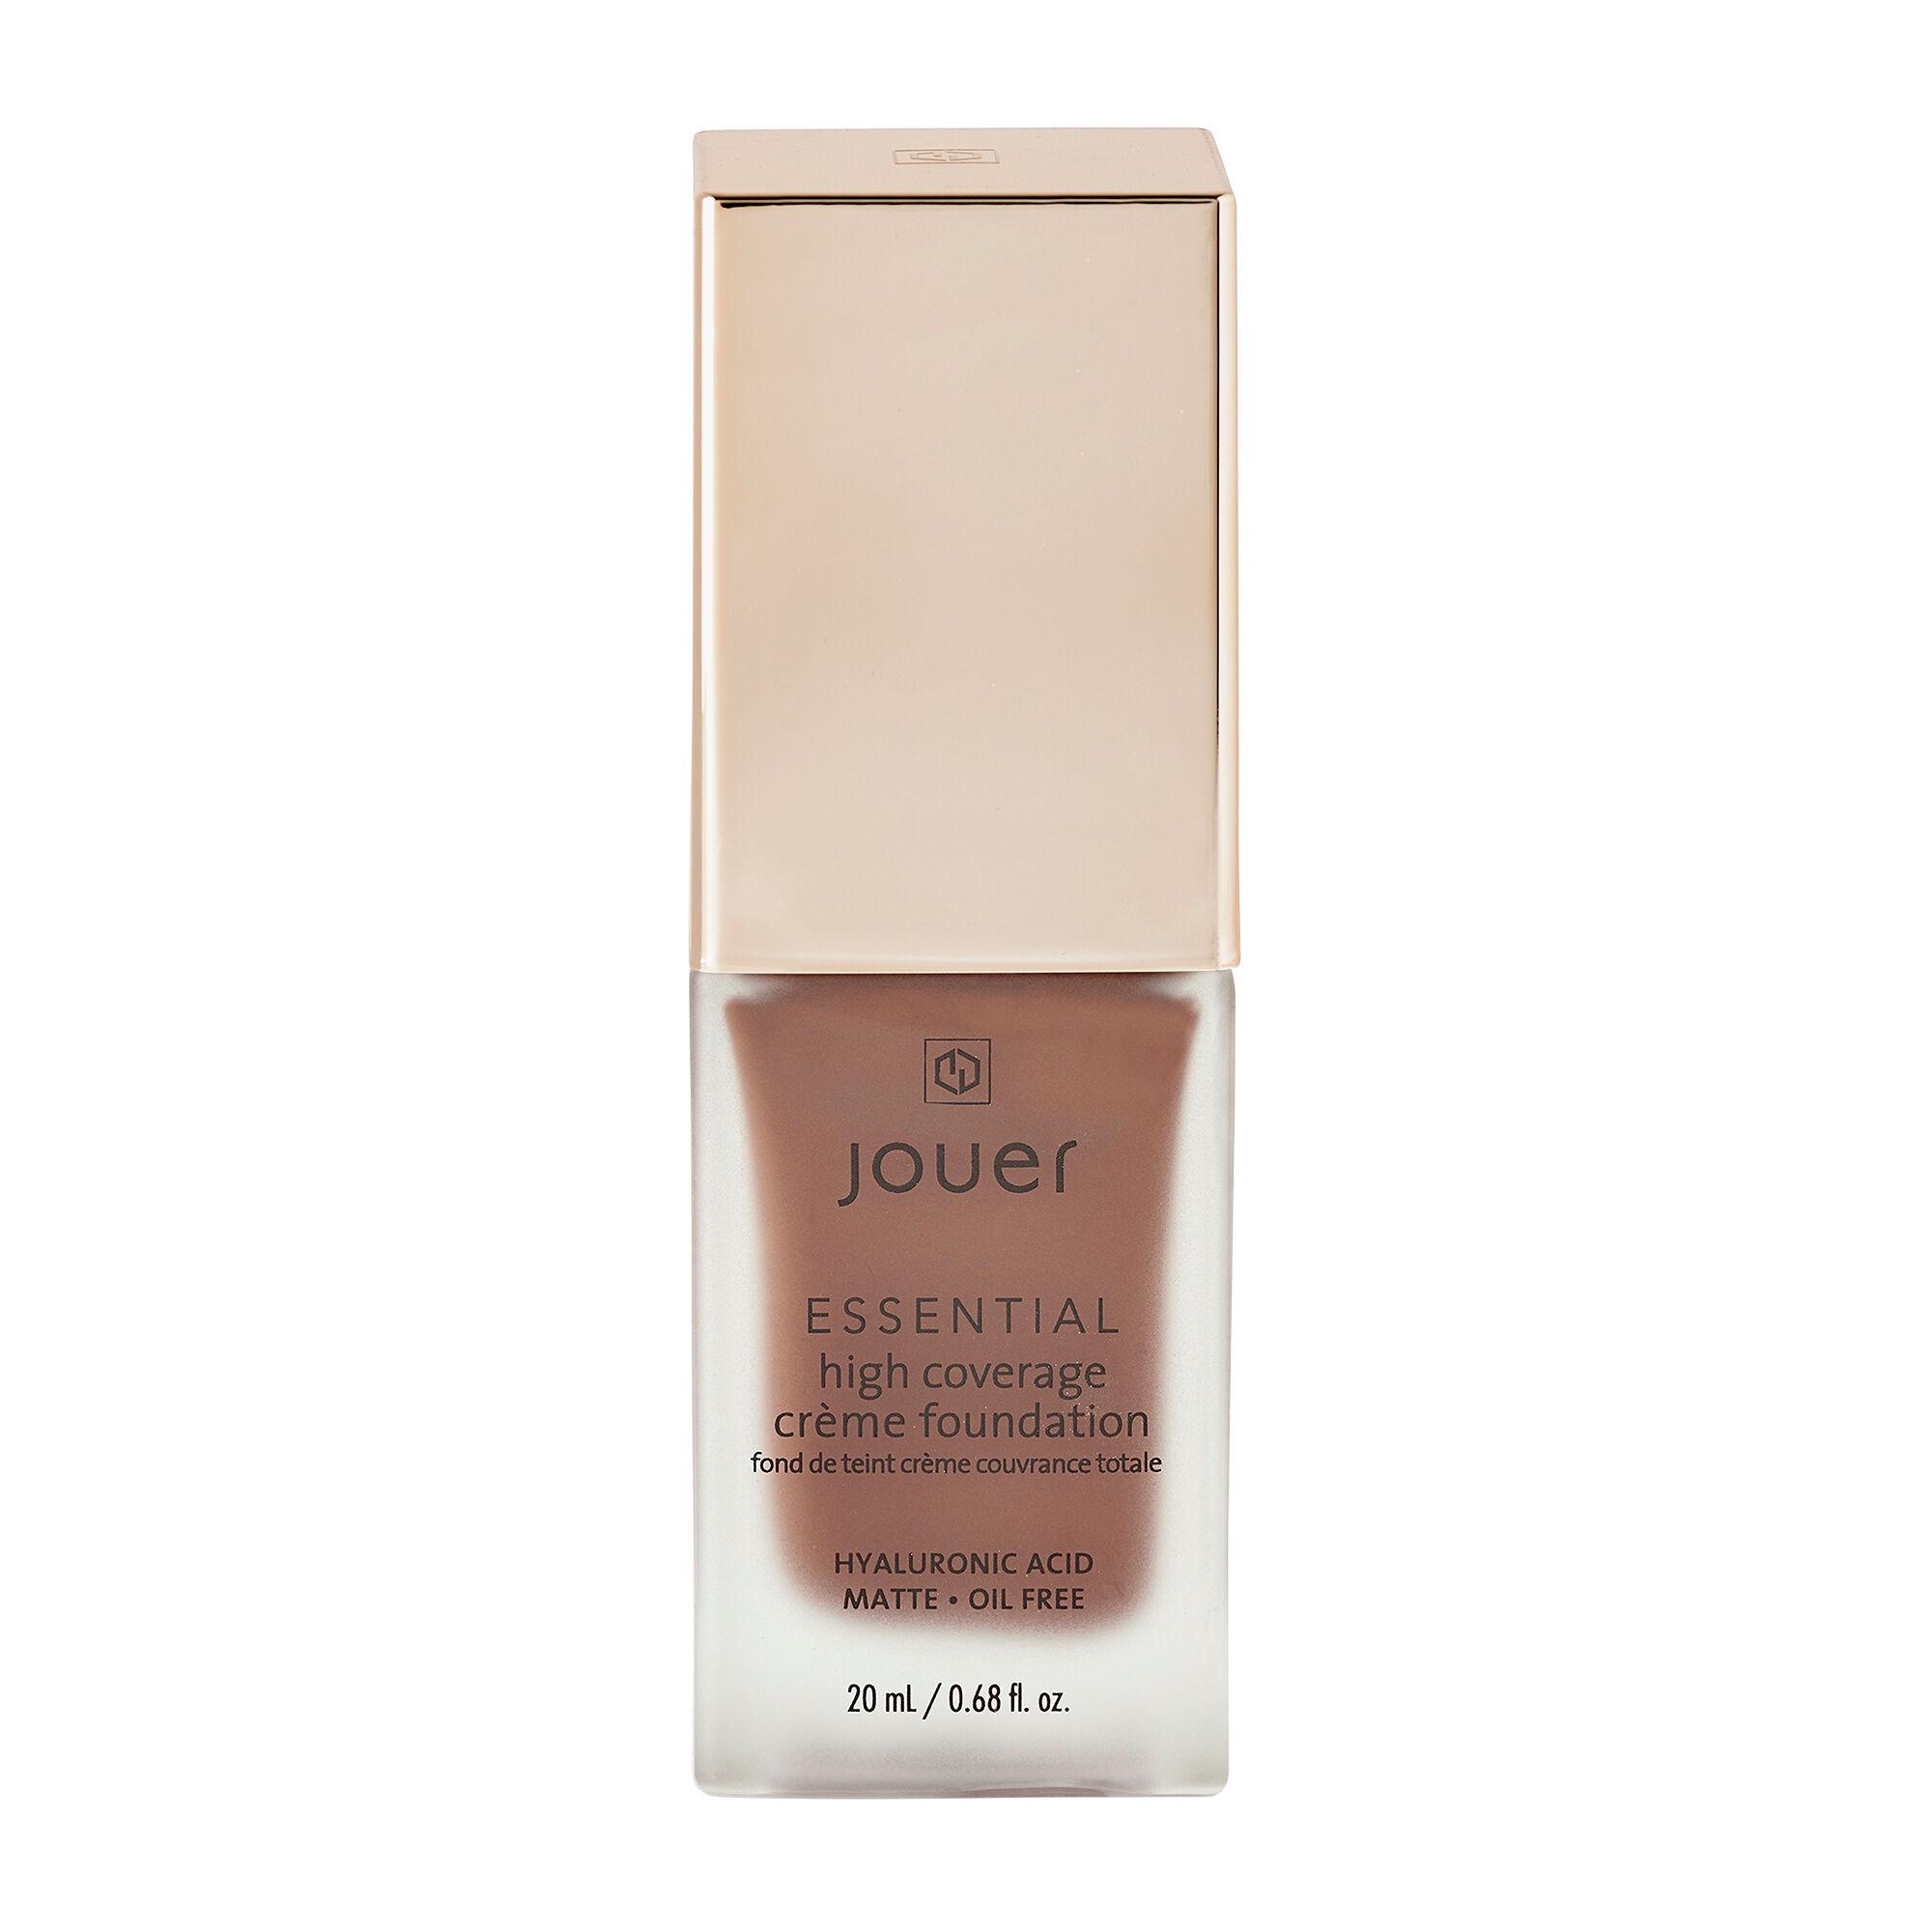 Jouer Cosmetics Essential High Coverage Creme Foundation Caviar 20ml